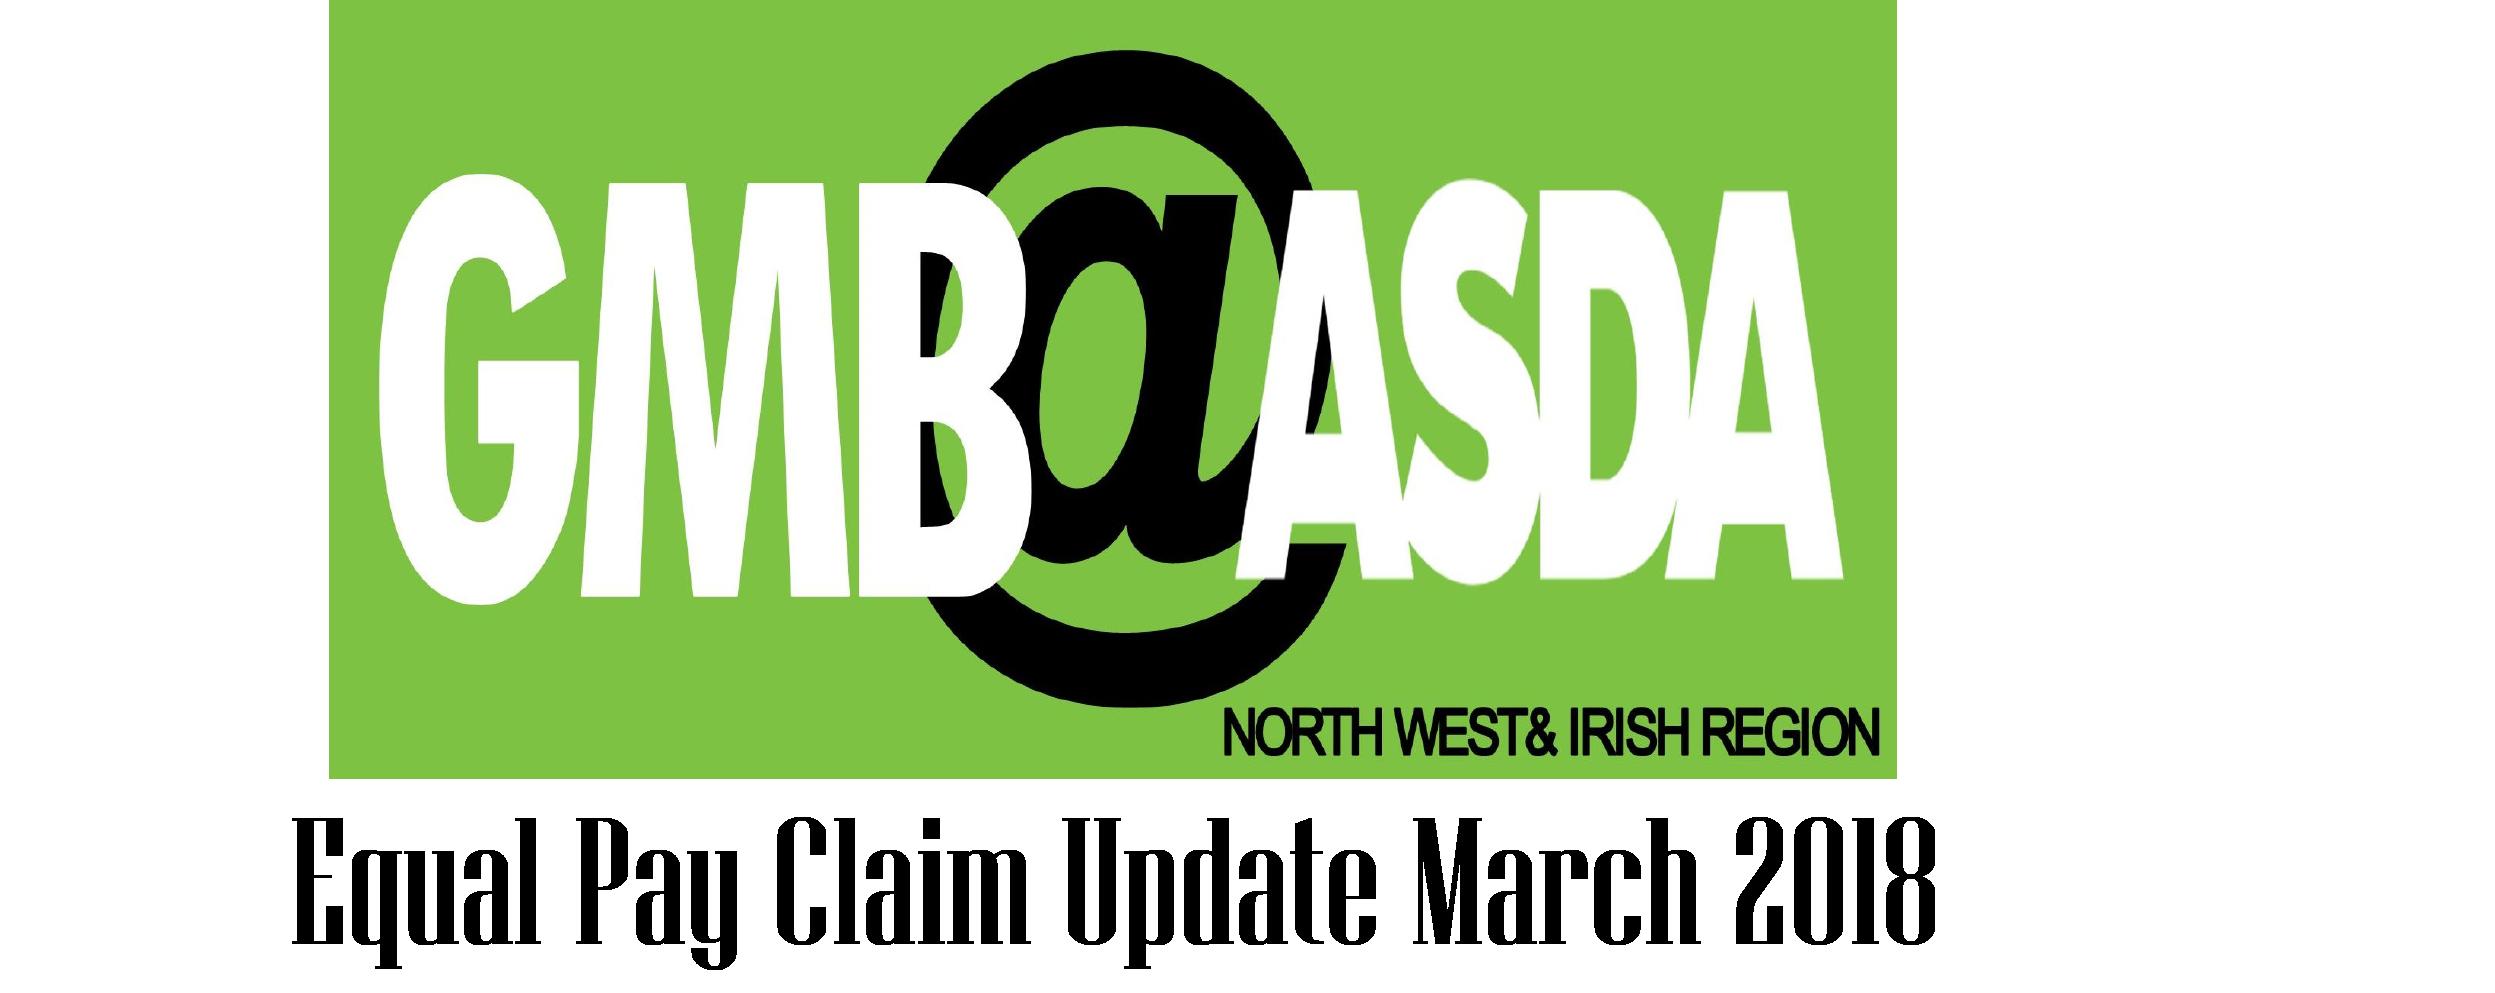 Gmb Update On Asda Equal Pay Claim Gmb Asda Trade Union